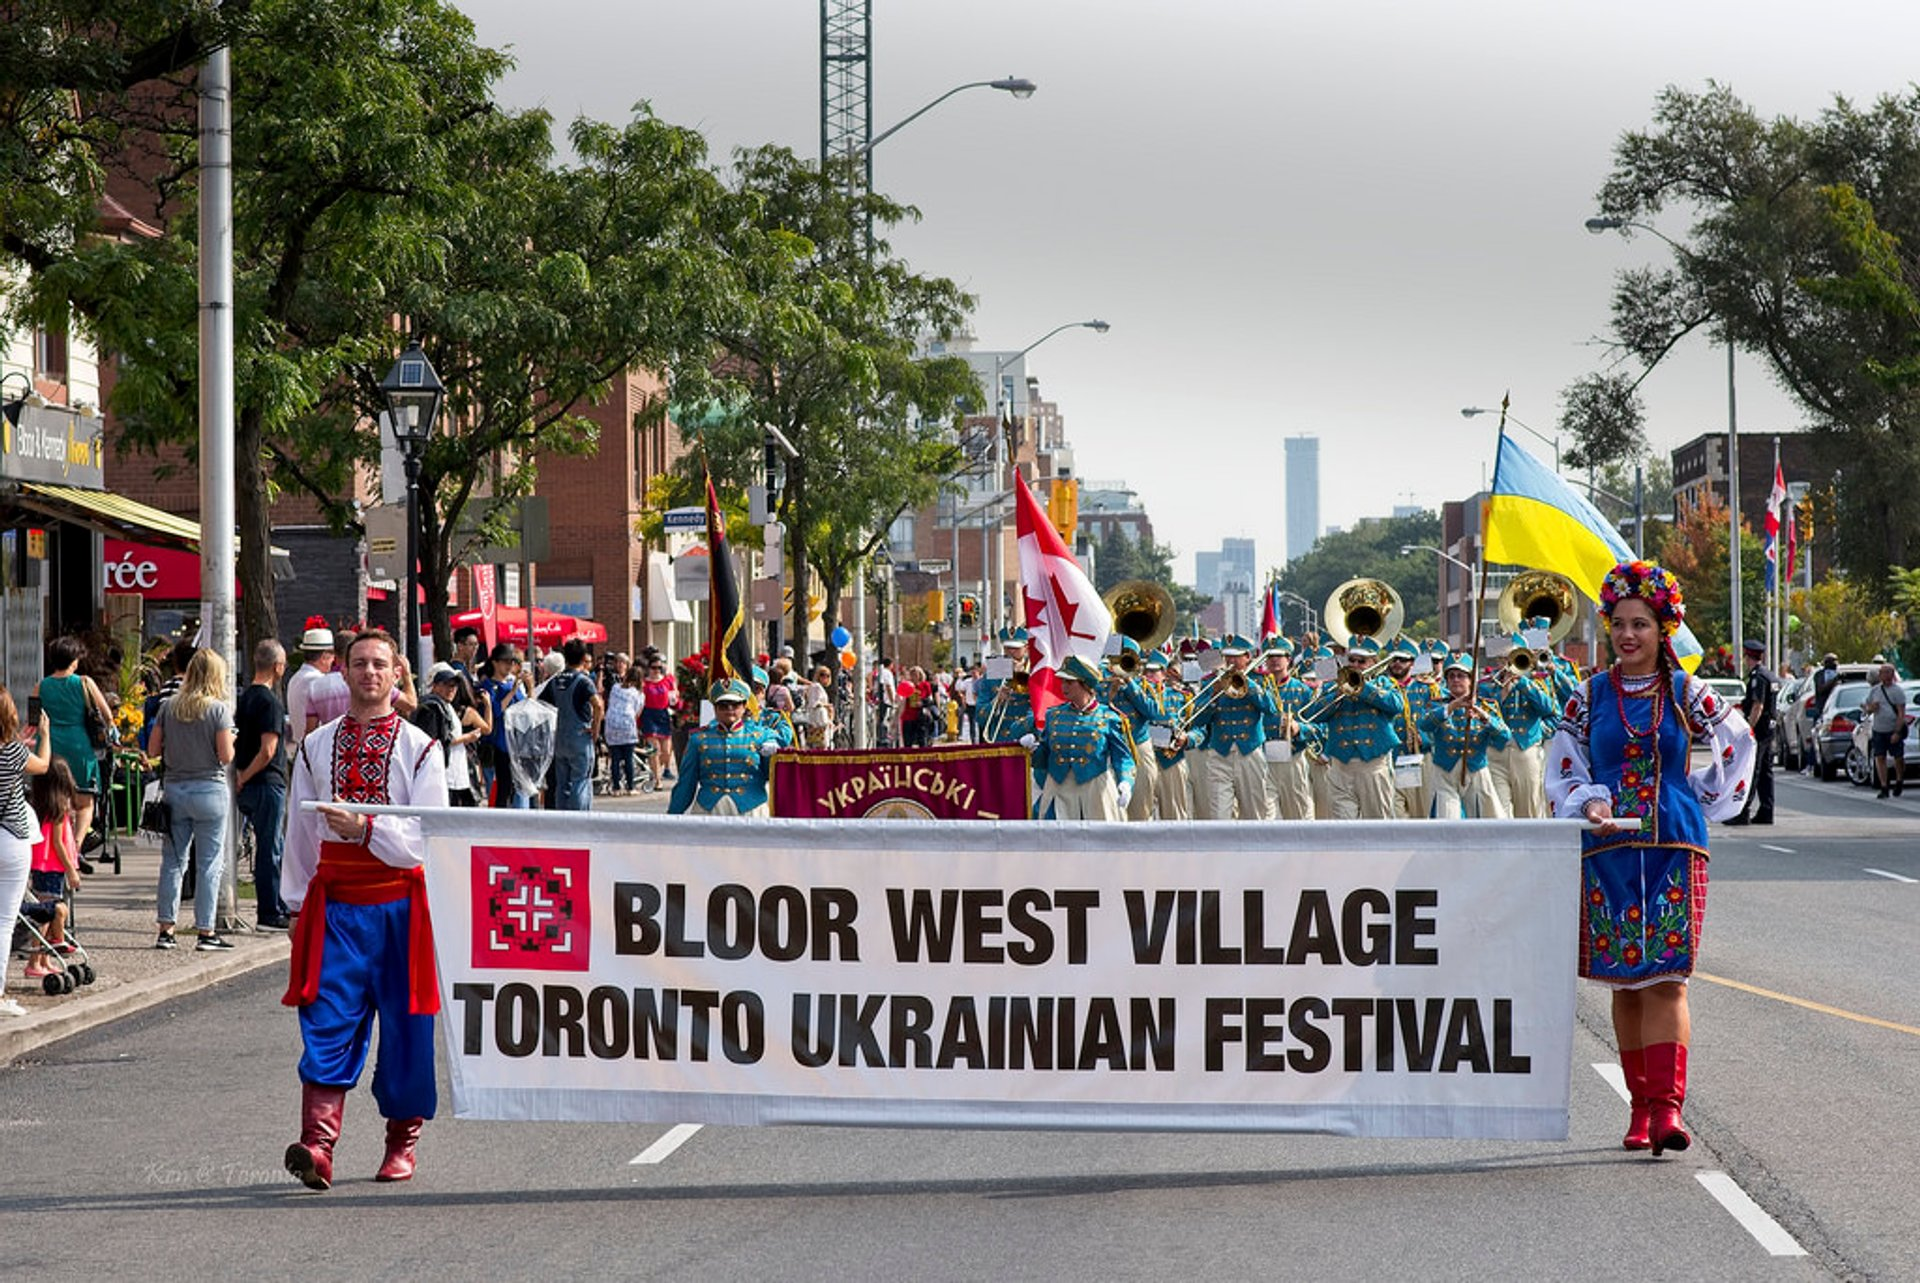 Toronto Ukrainian Festival in Toronto 2019 - Best Time